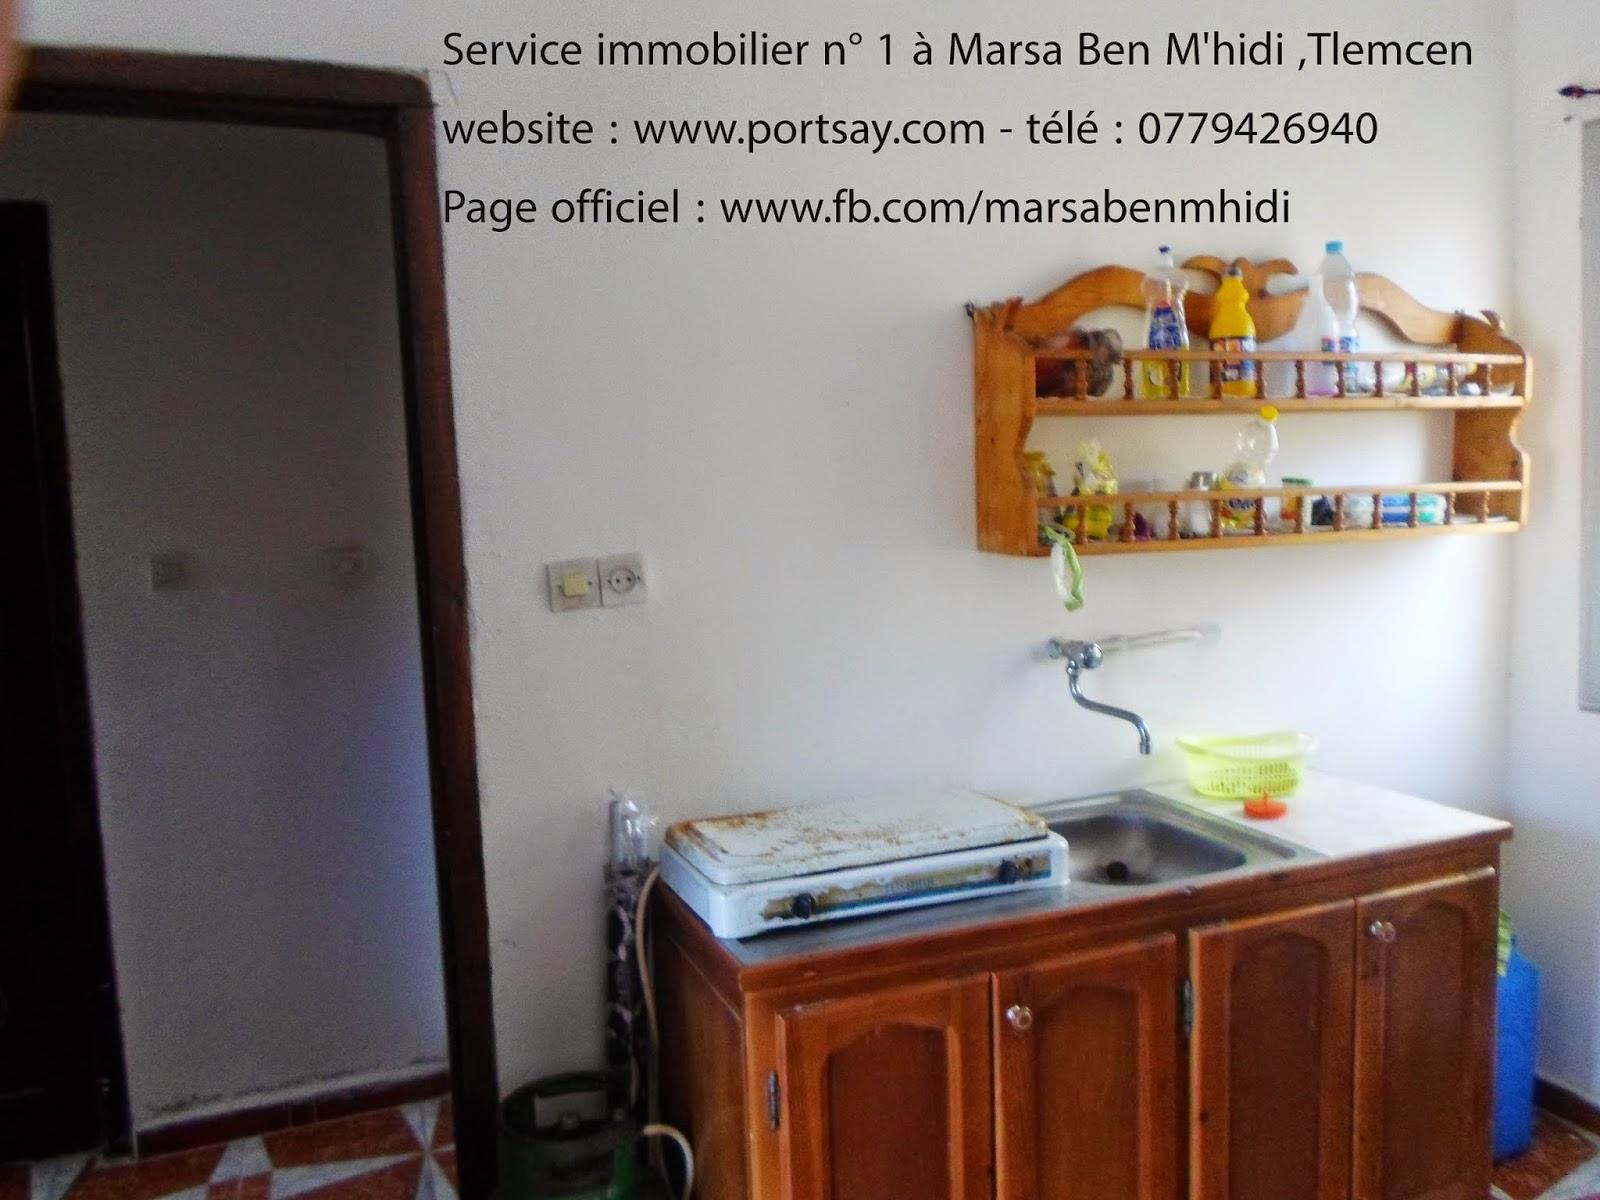 résidence à vendre 97 m² à marsa ben mhidi